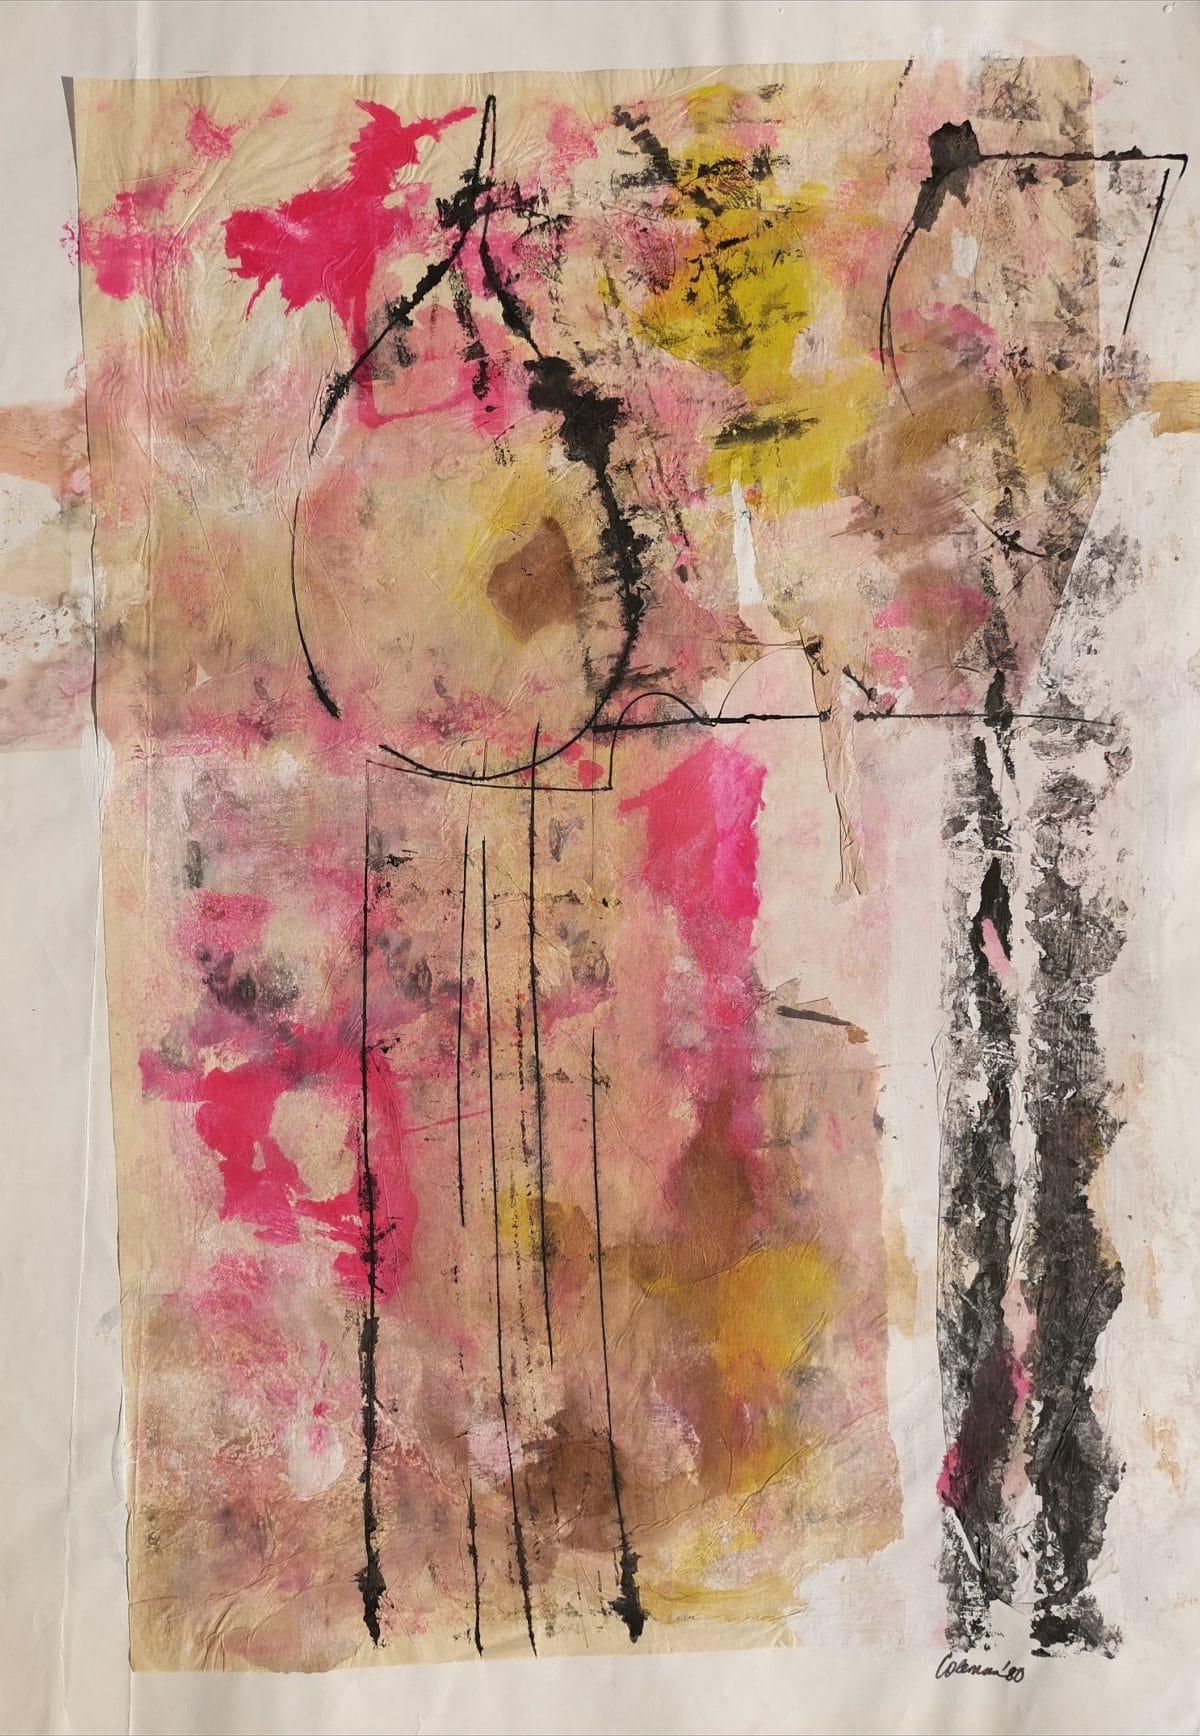 Trevor Coleman - Tissue Paper Collage - 1980